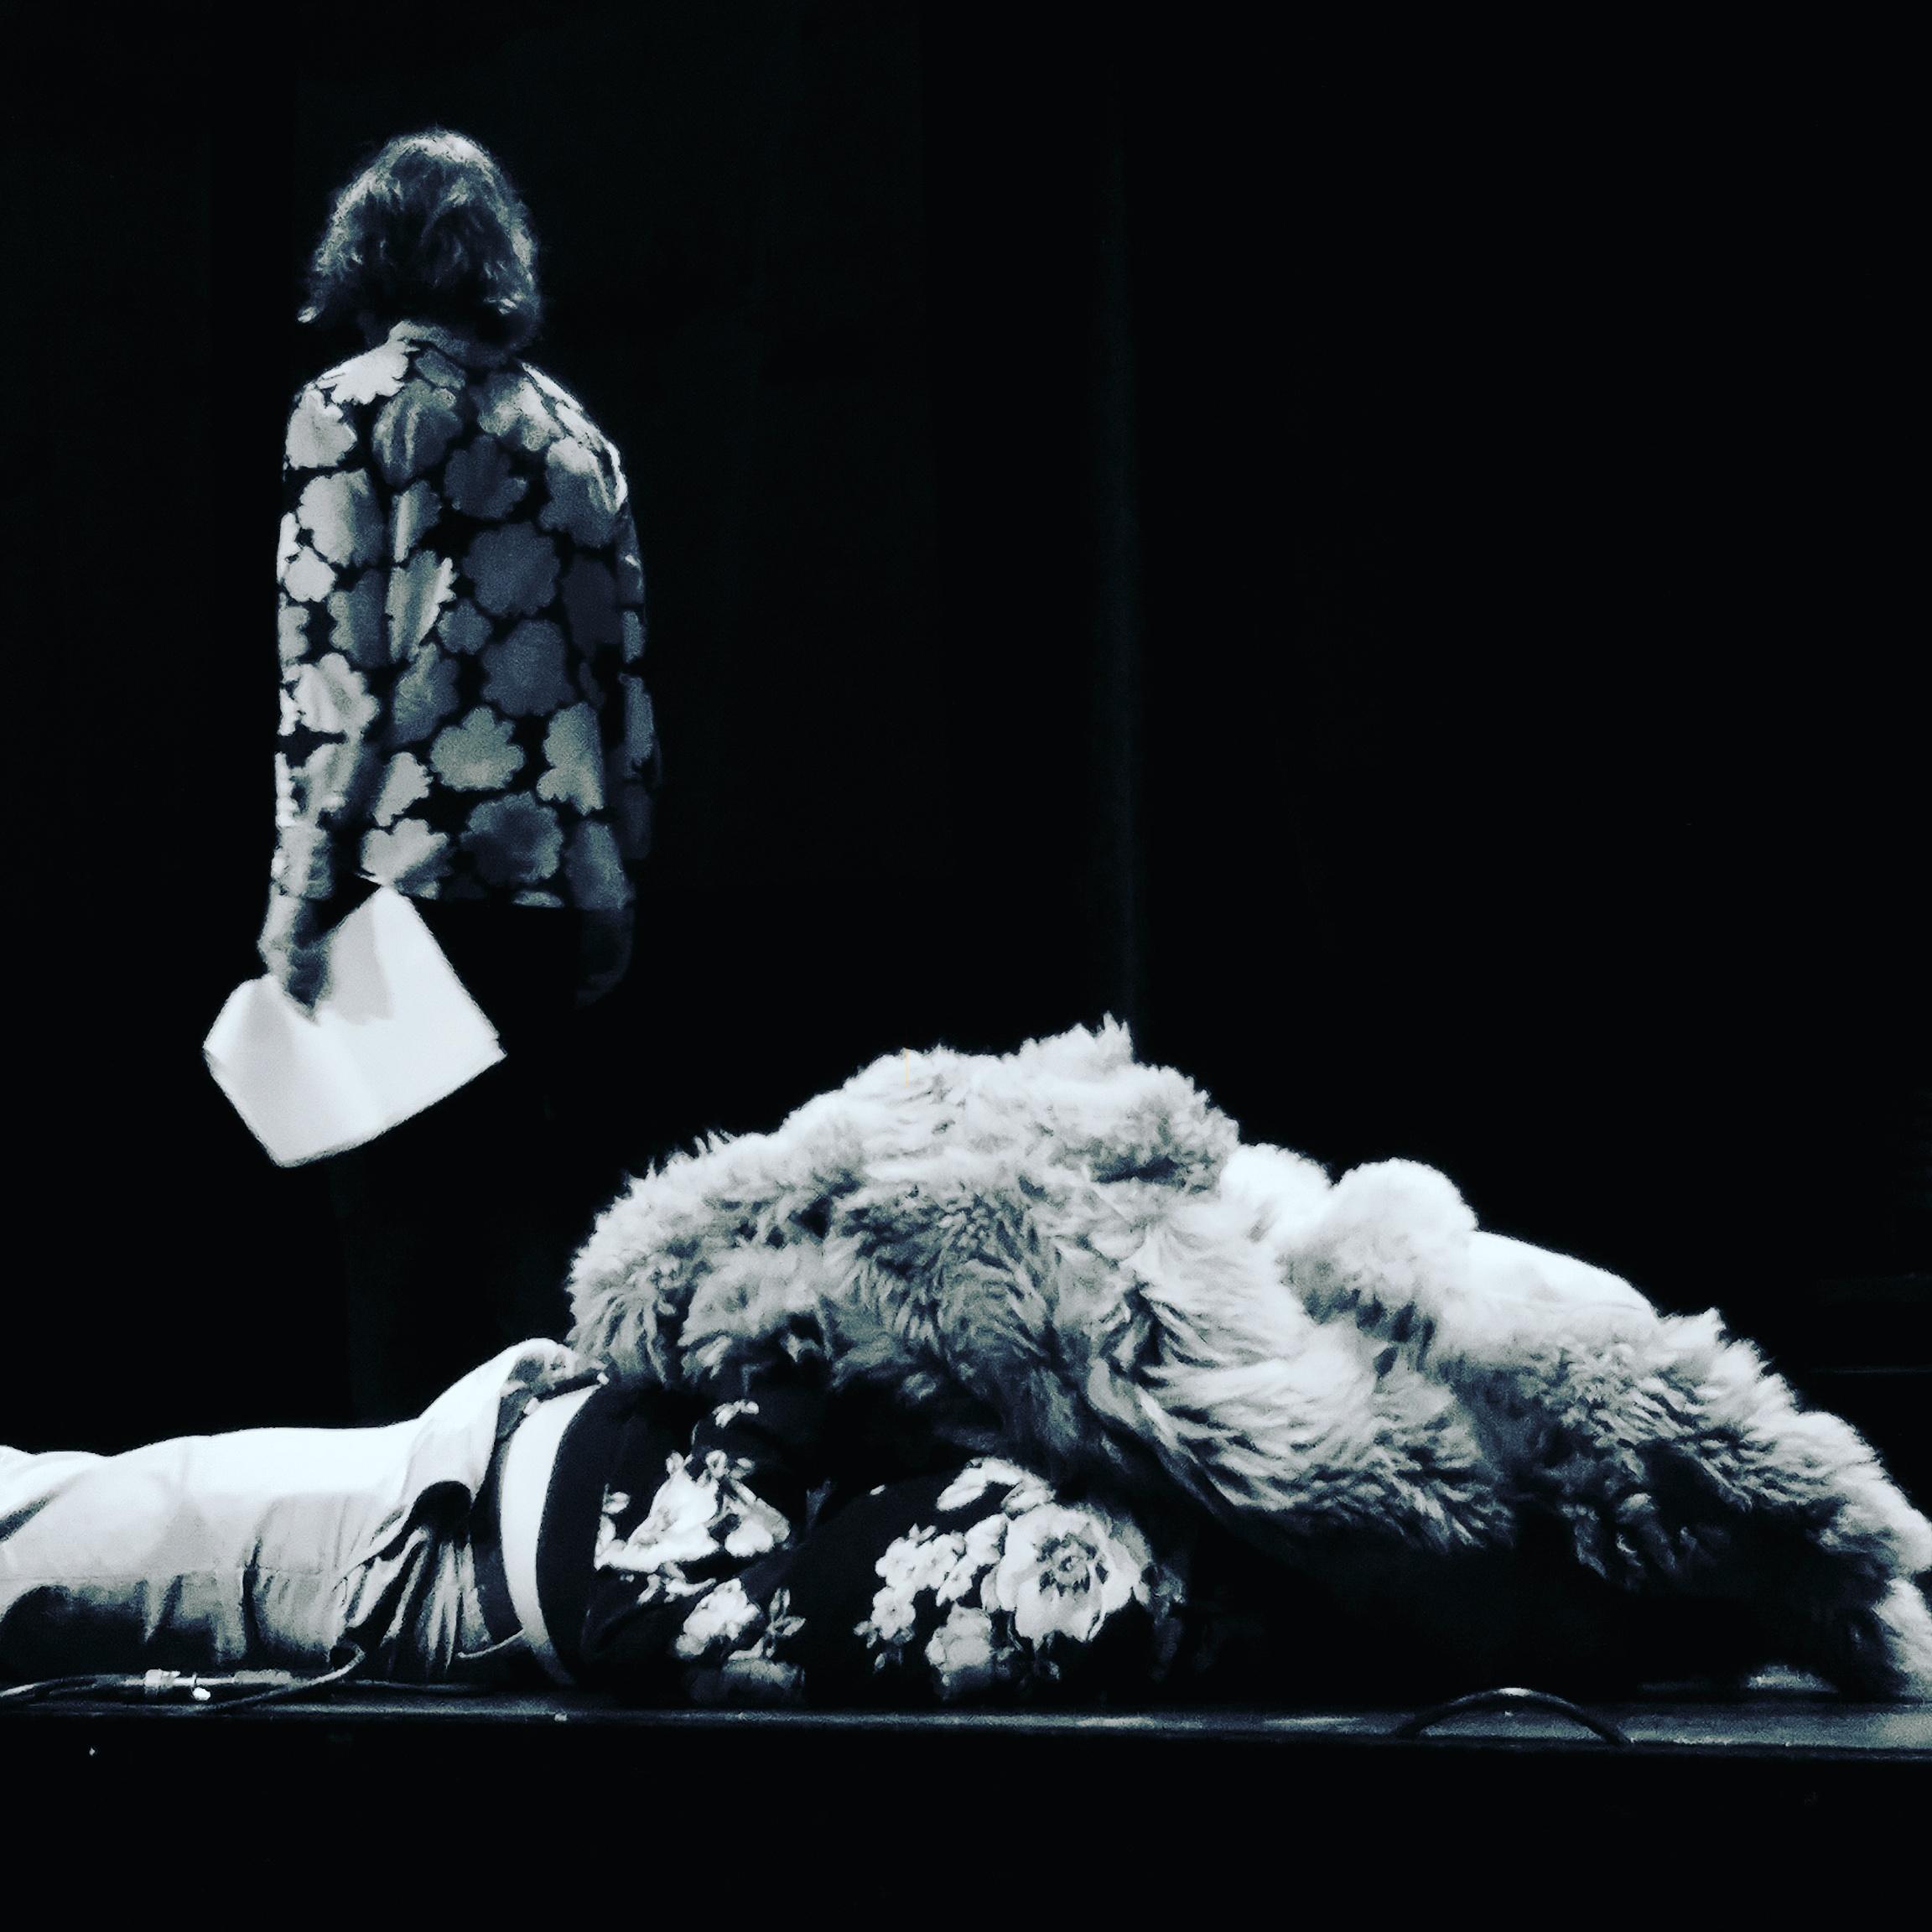 Stockholm International Poetry Festival: Sweden 2016